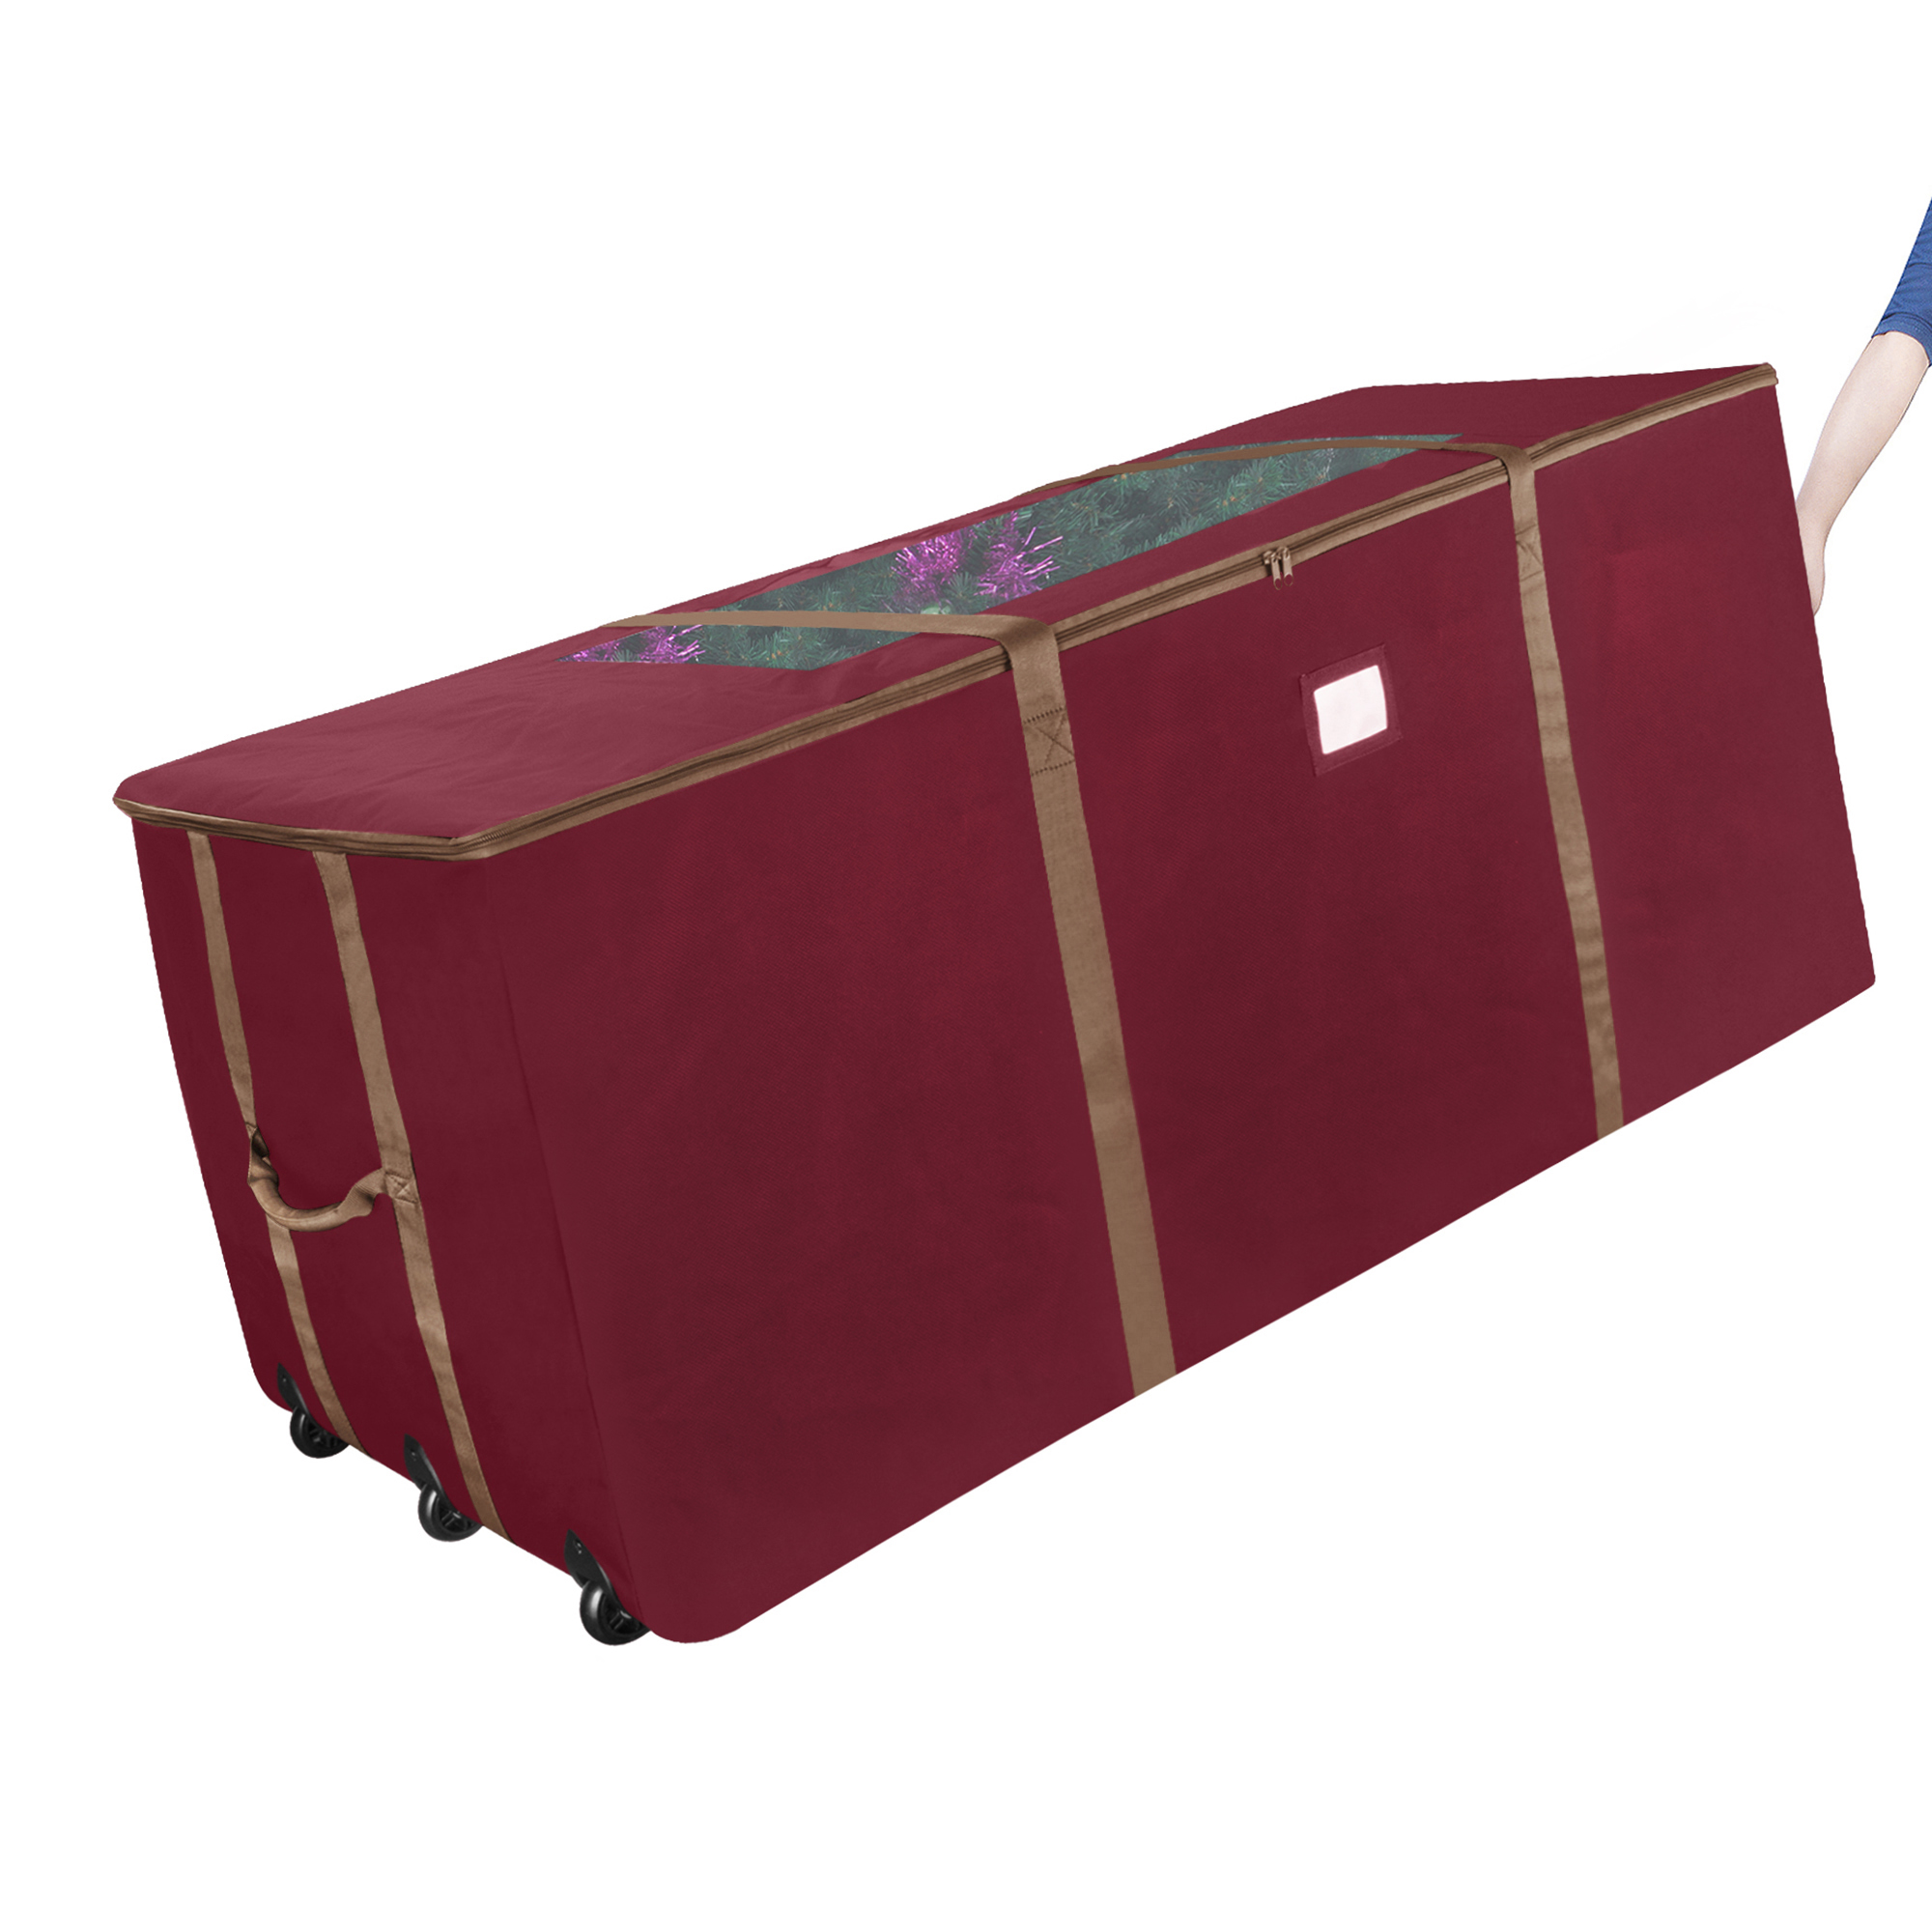 Elf Stor Red Rolling Christmas Tree Storage Duffel Bag w/Window for 12 Ft Tree